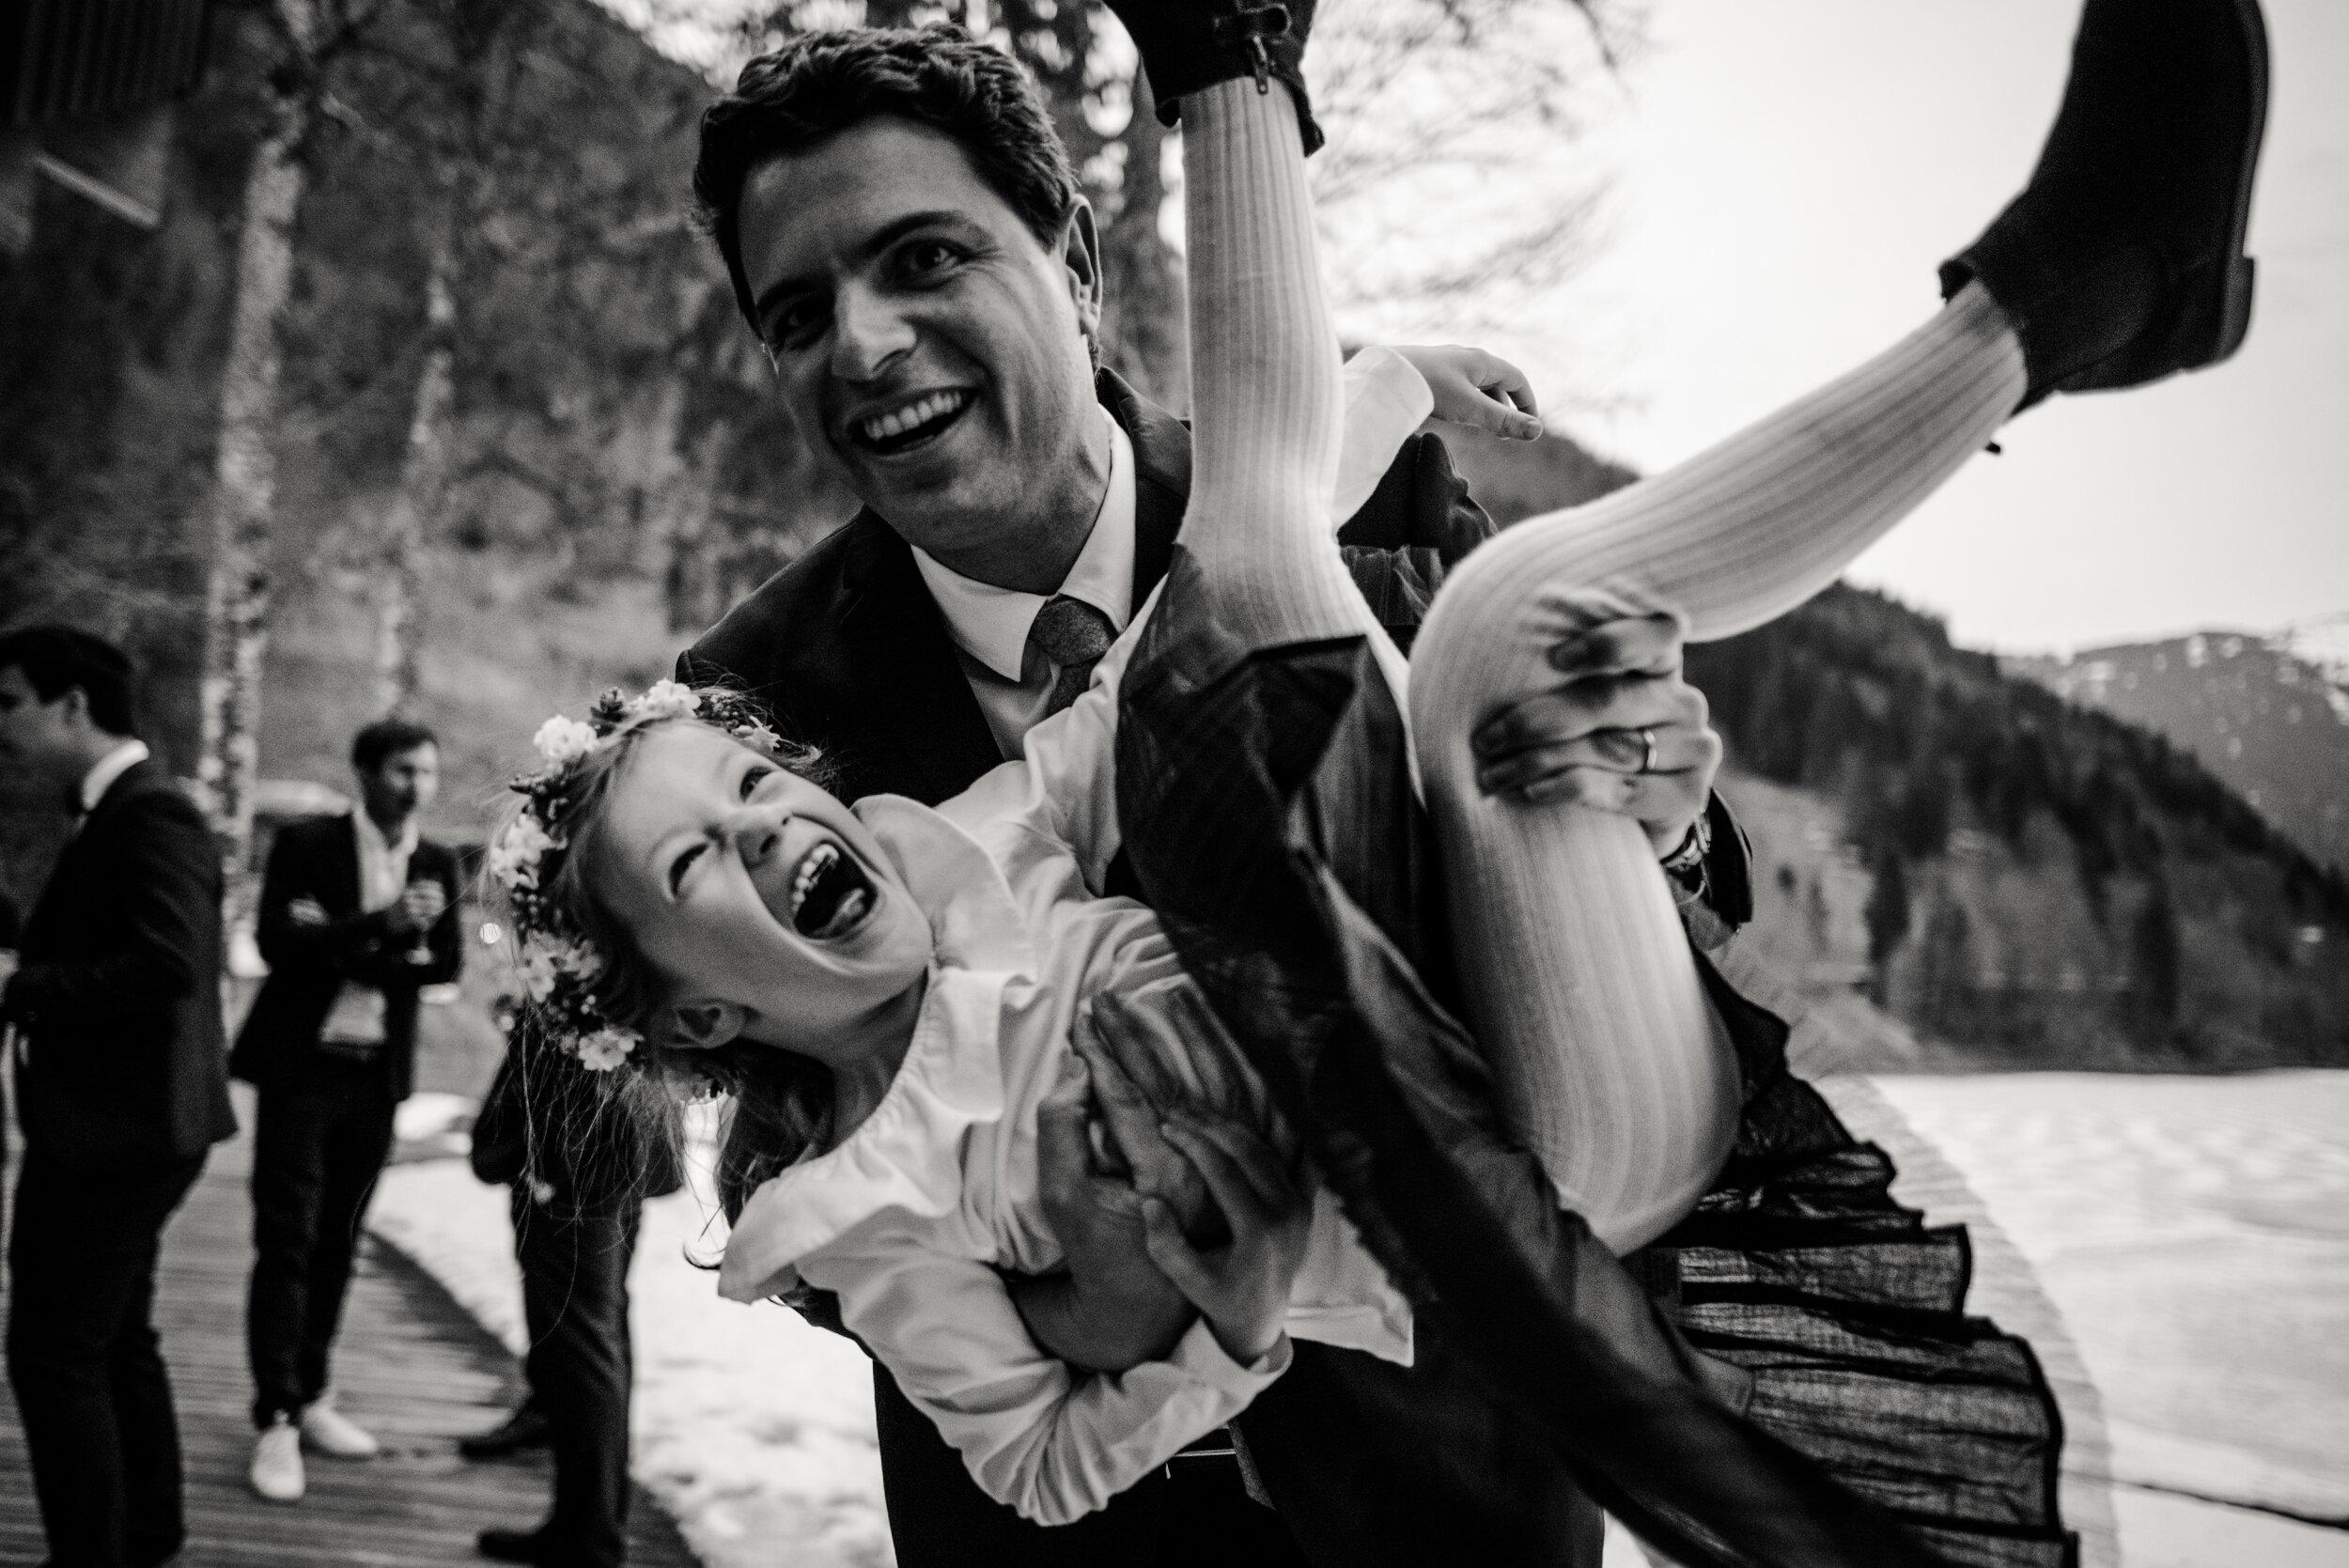 Léa-Fery-Photographe-Bretagne-Mariage-Famille-5105.jpg